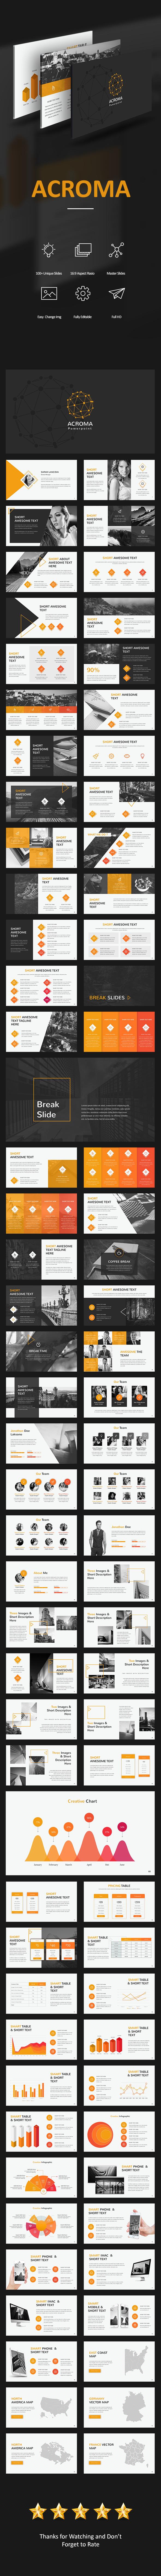 Acroma Powerpoint - Creative PowerPoint Templates